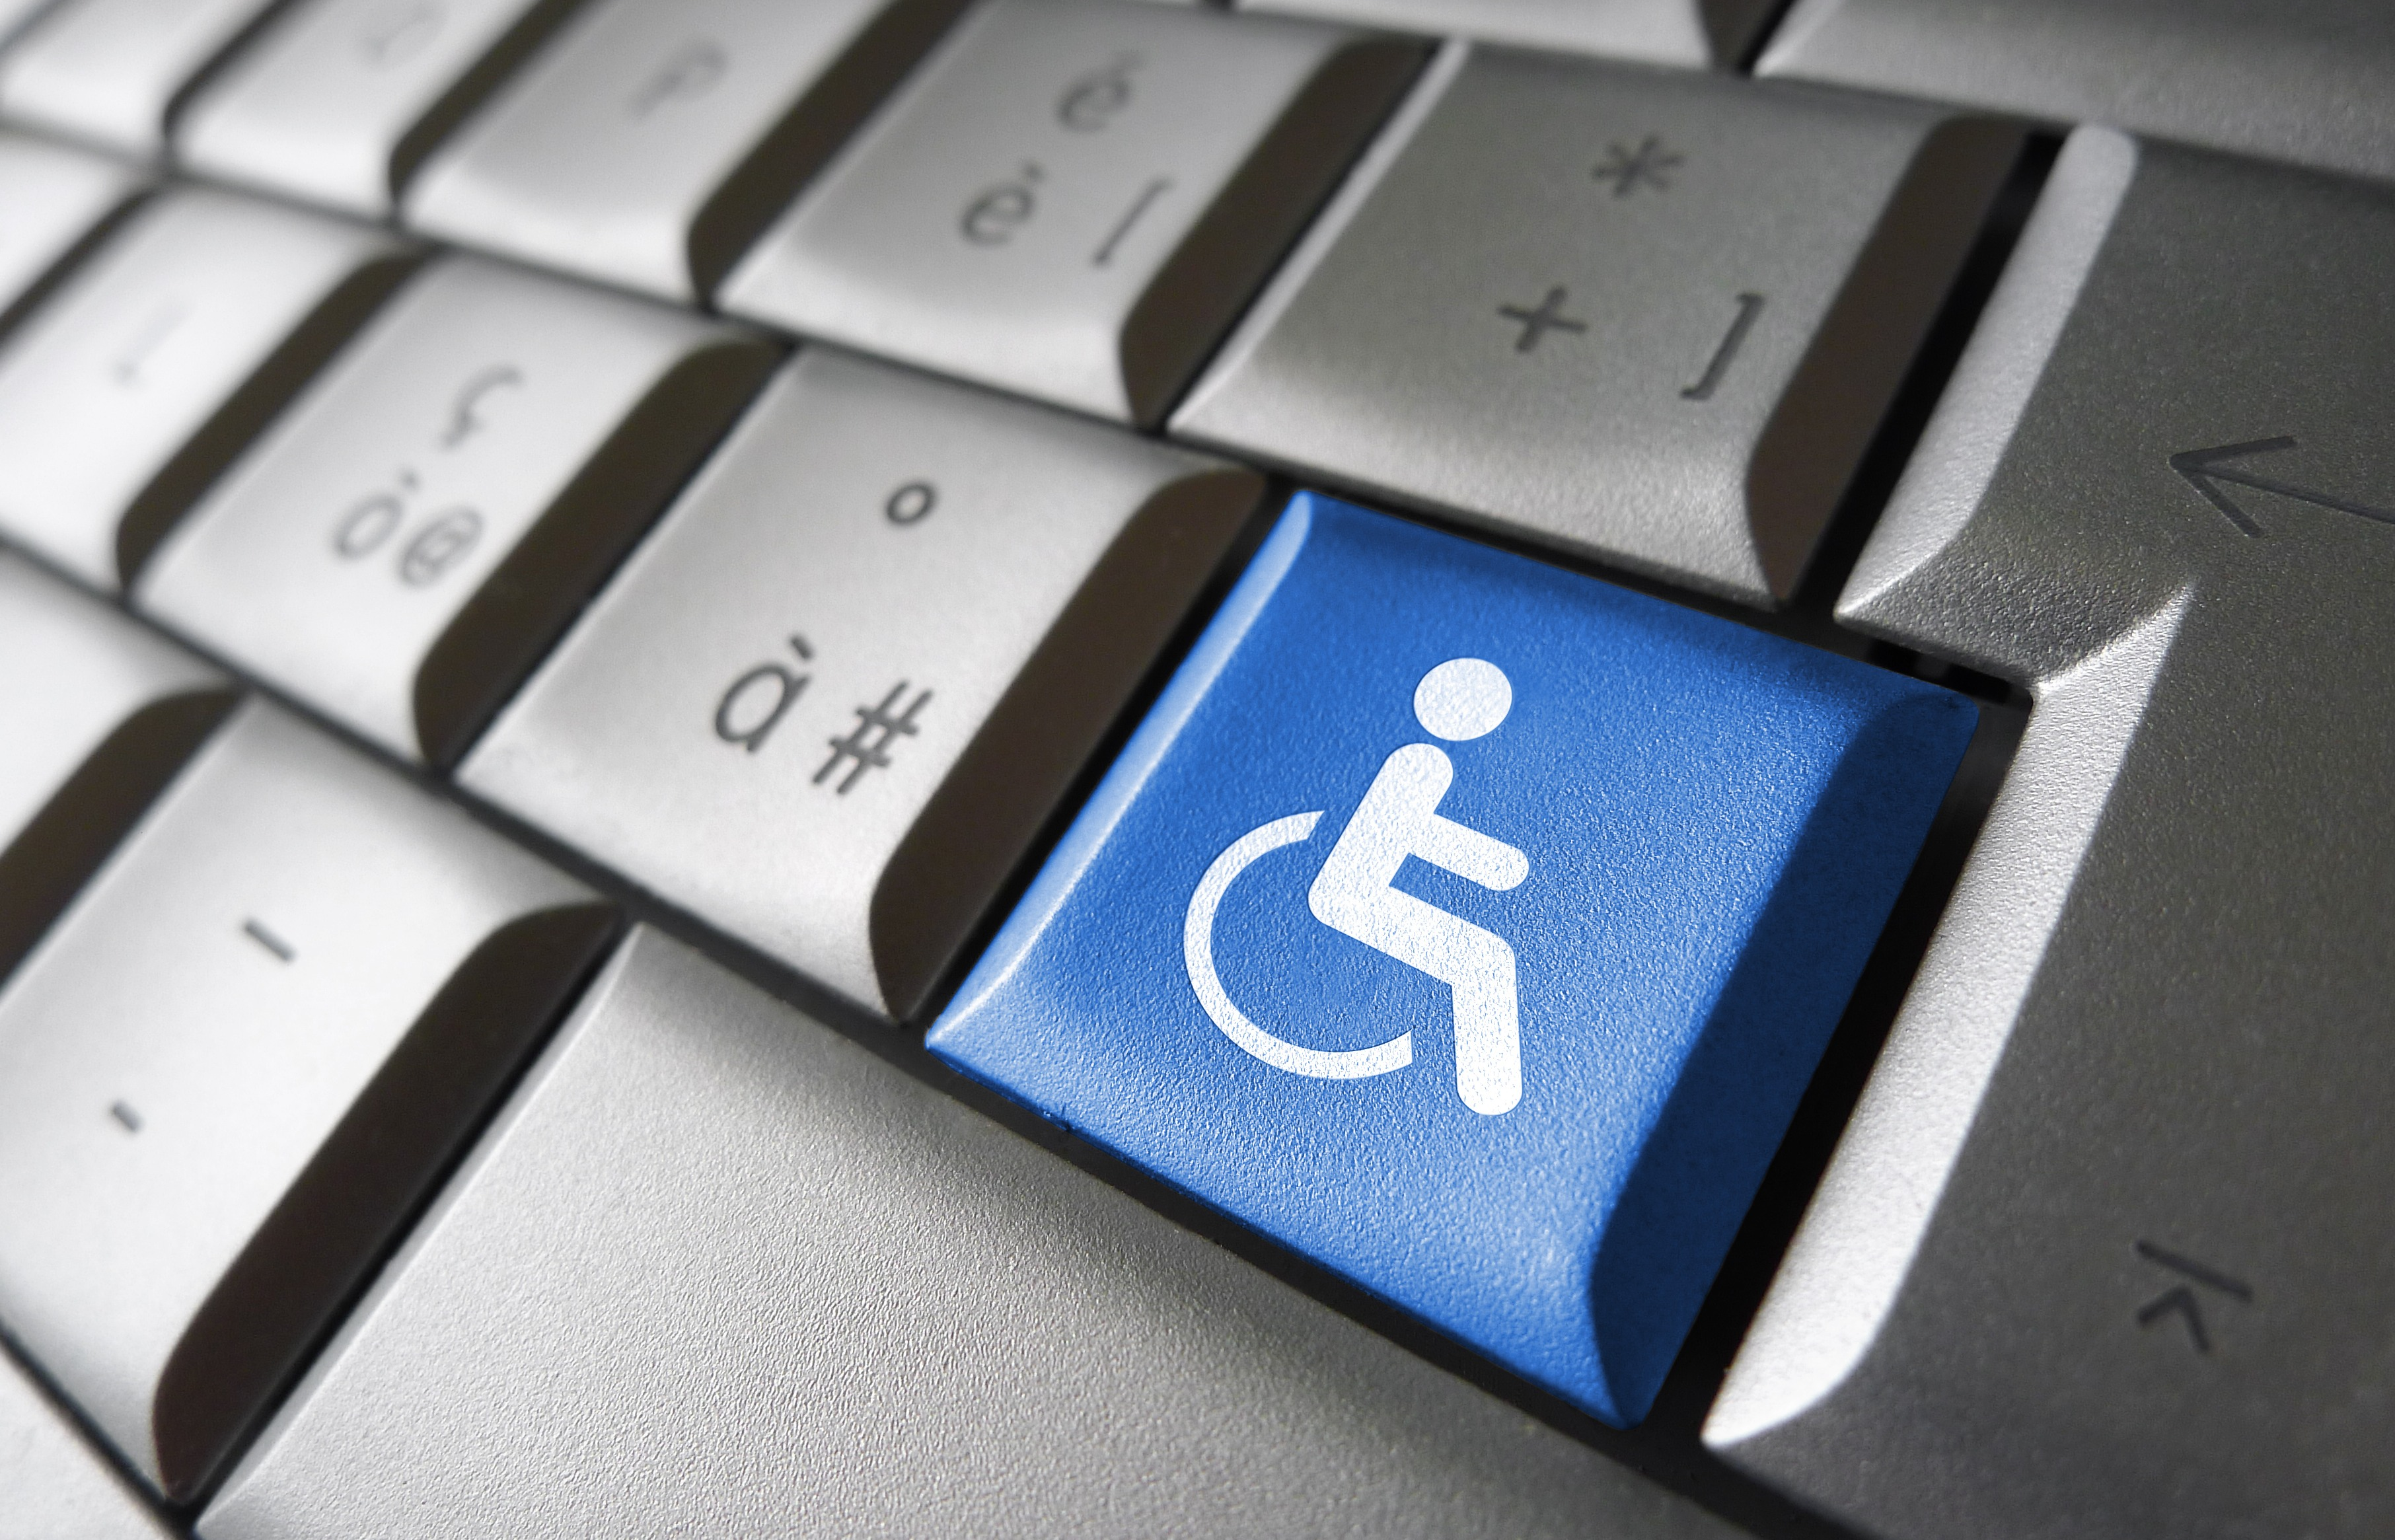 accessible keyboard